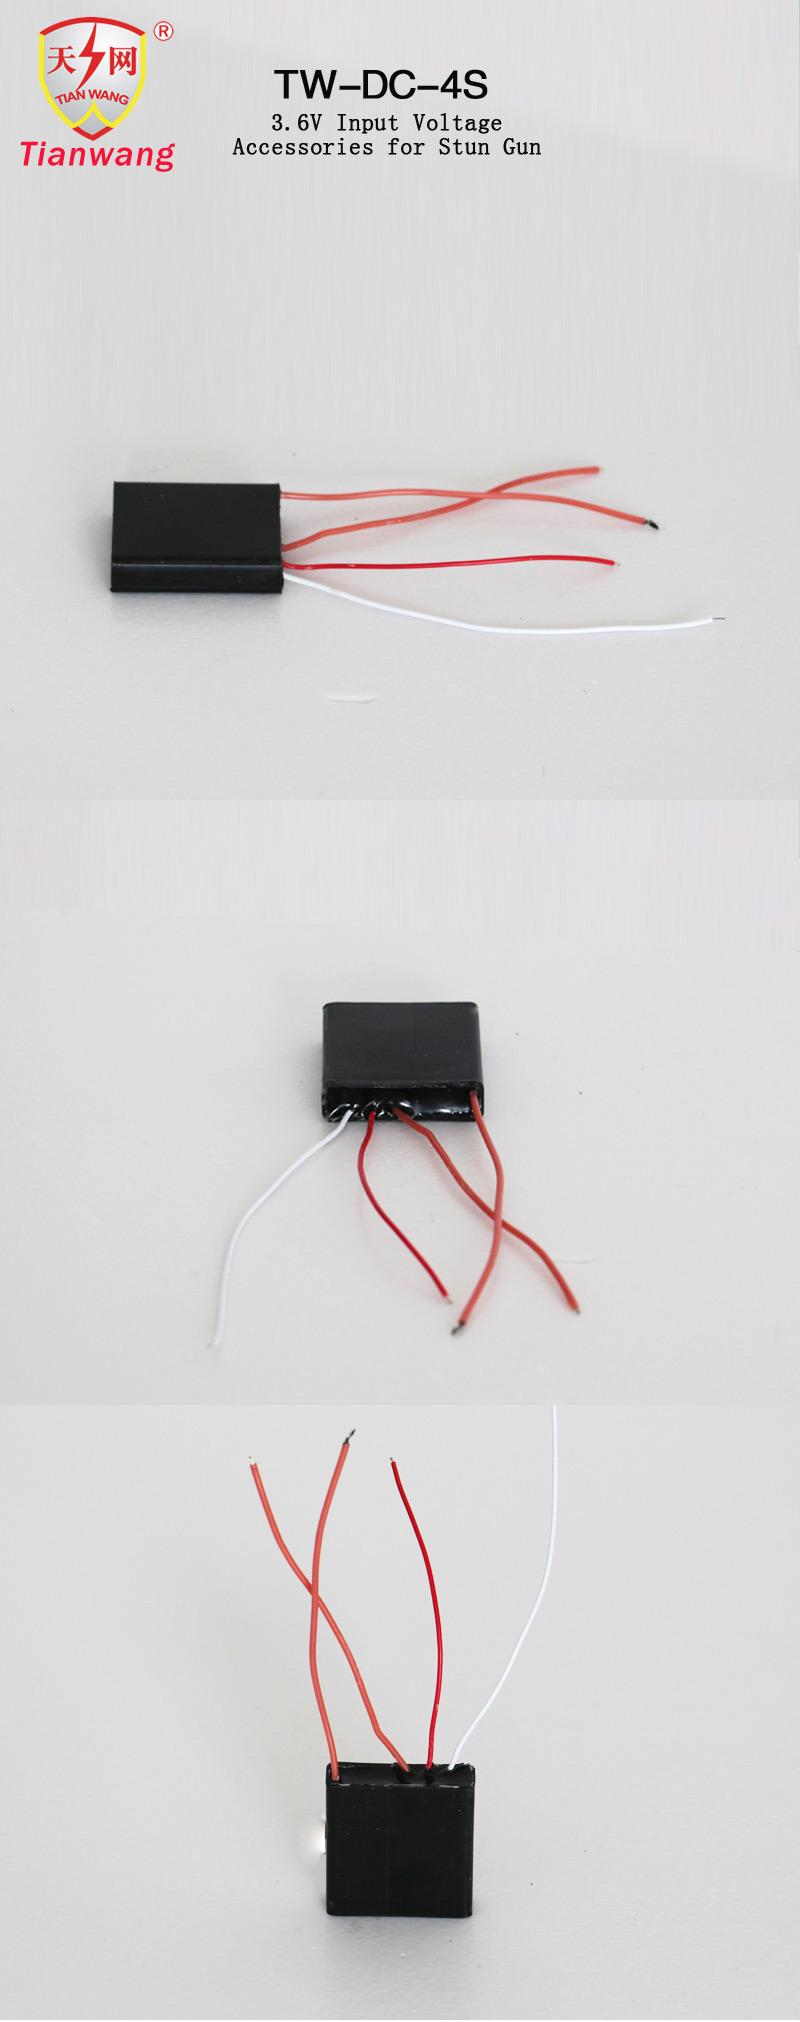 Super Slim High Voltage Inverter 3v 6v To 12000v China Electronic Stun Gun Circuit Product Description